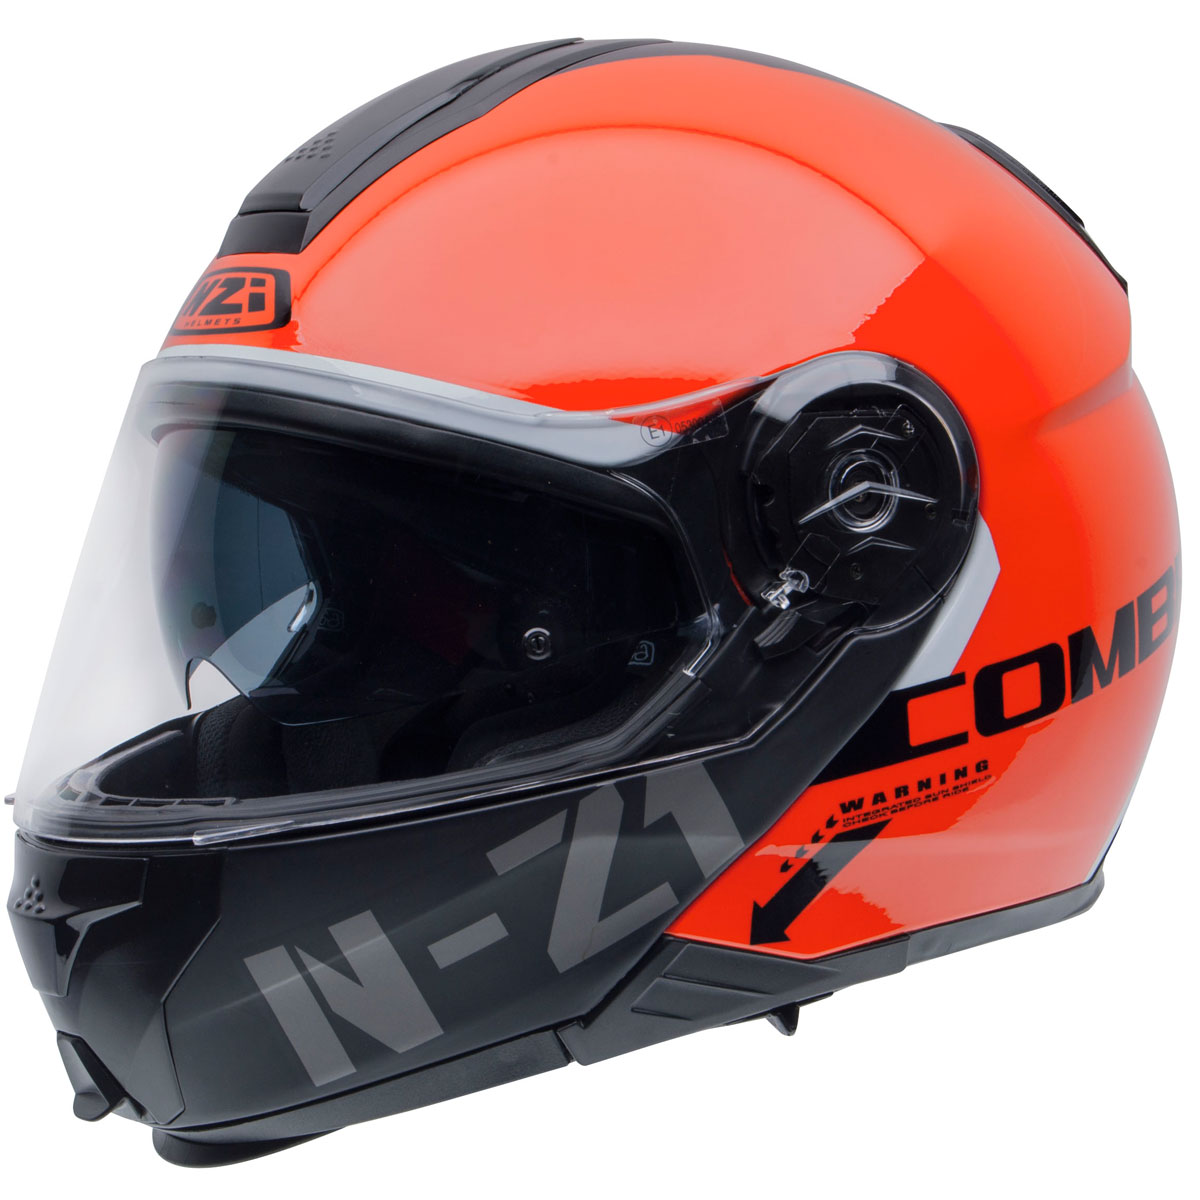 Capacete NZI Combi 2 Flydeck (C/ VISEIRA SOLAR) Laranja - Escamoteável - LANÇAMENTO 2021  - Nova Centro Boutique Roupas para Motociclistas